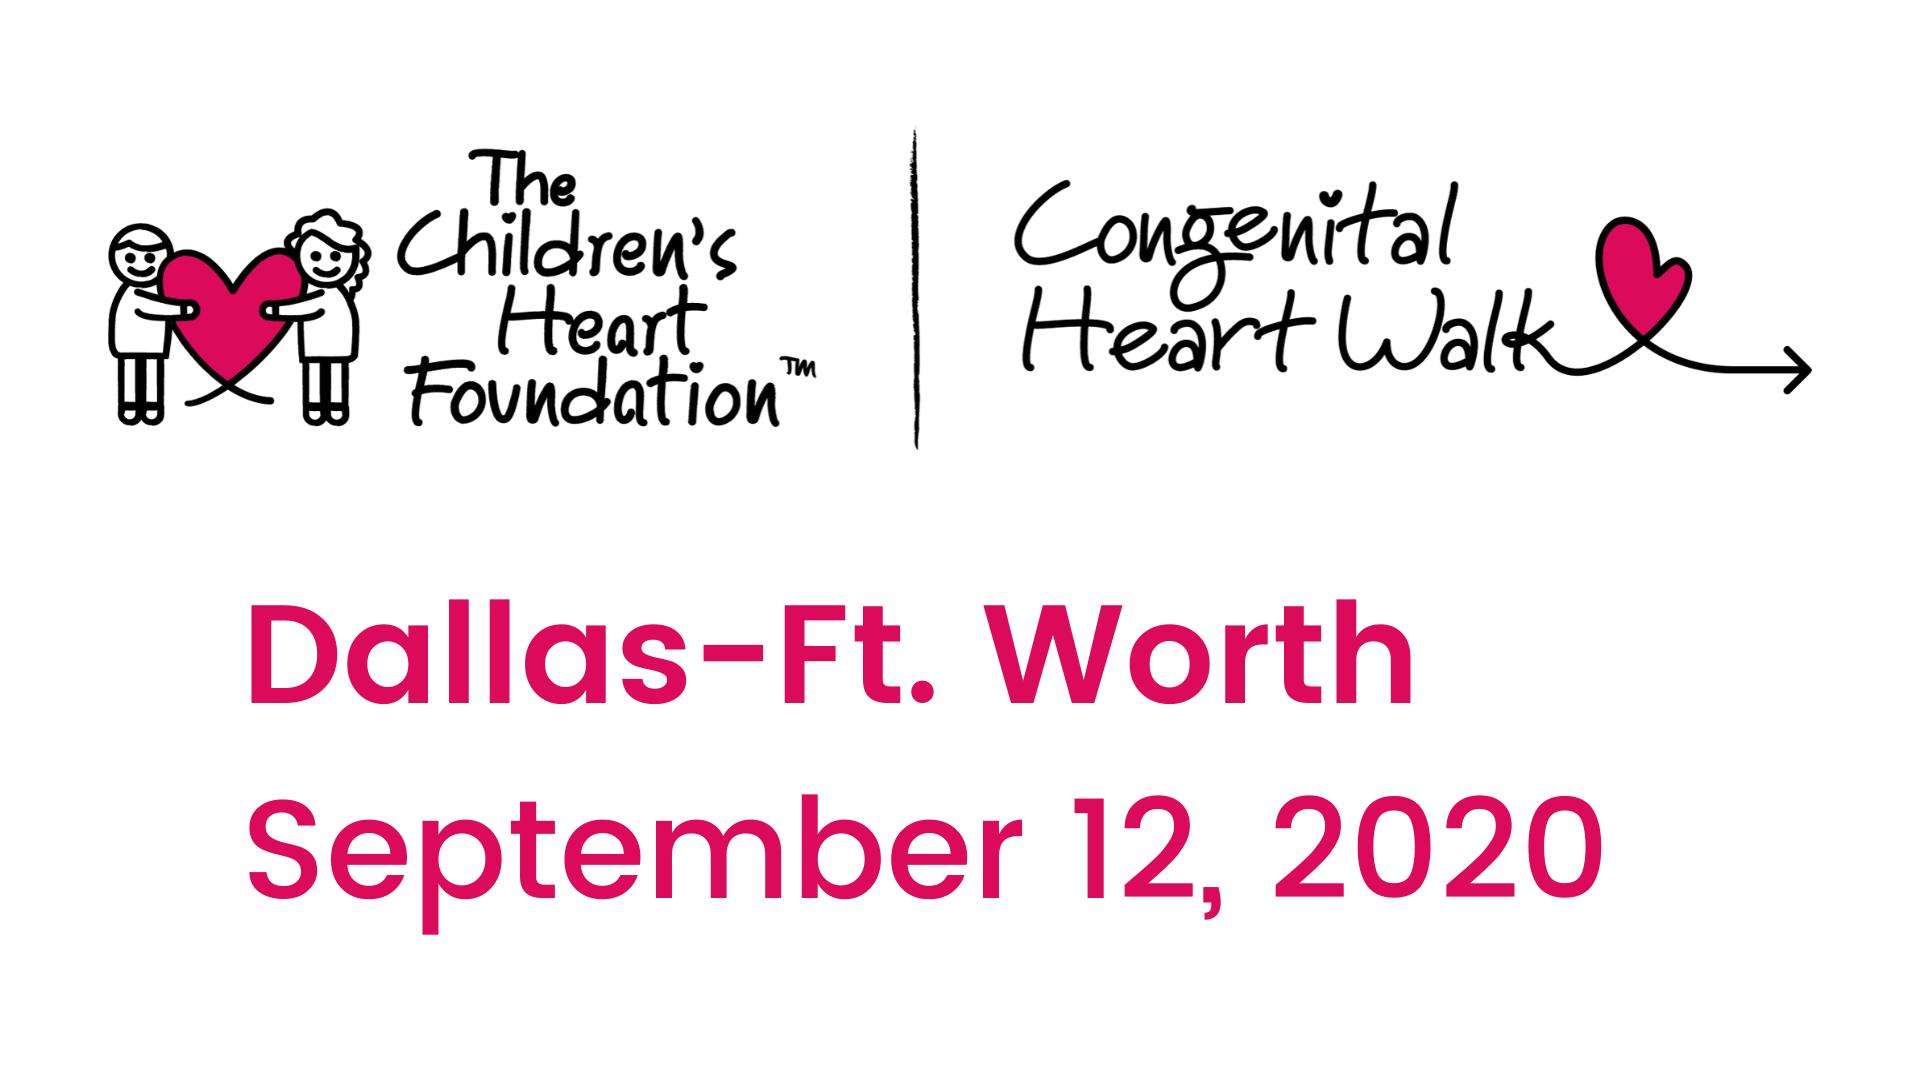 Dallas-Ft. Worth Congenital Heart Walk